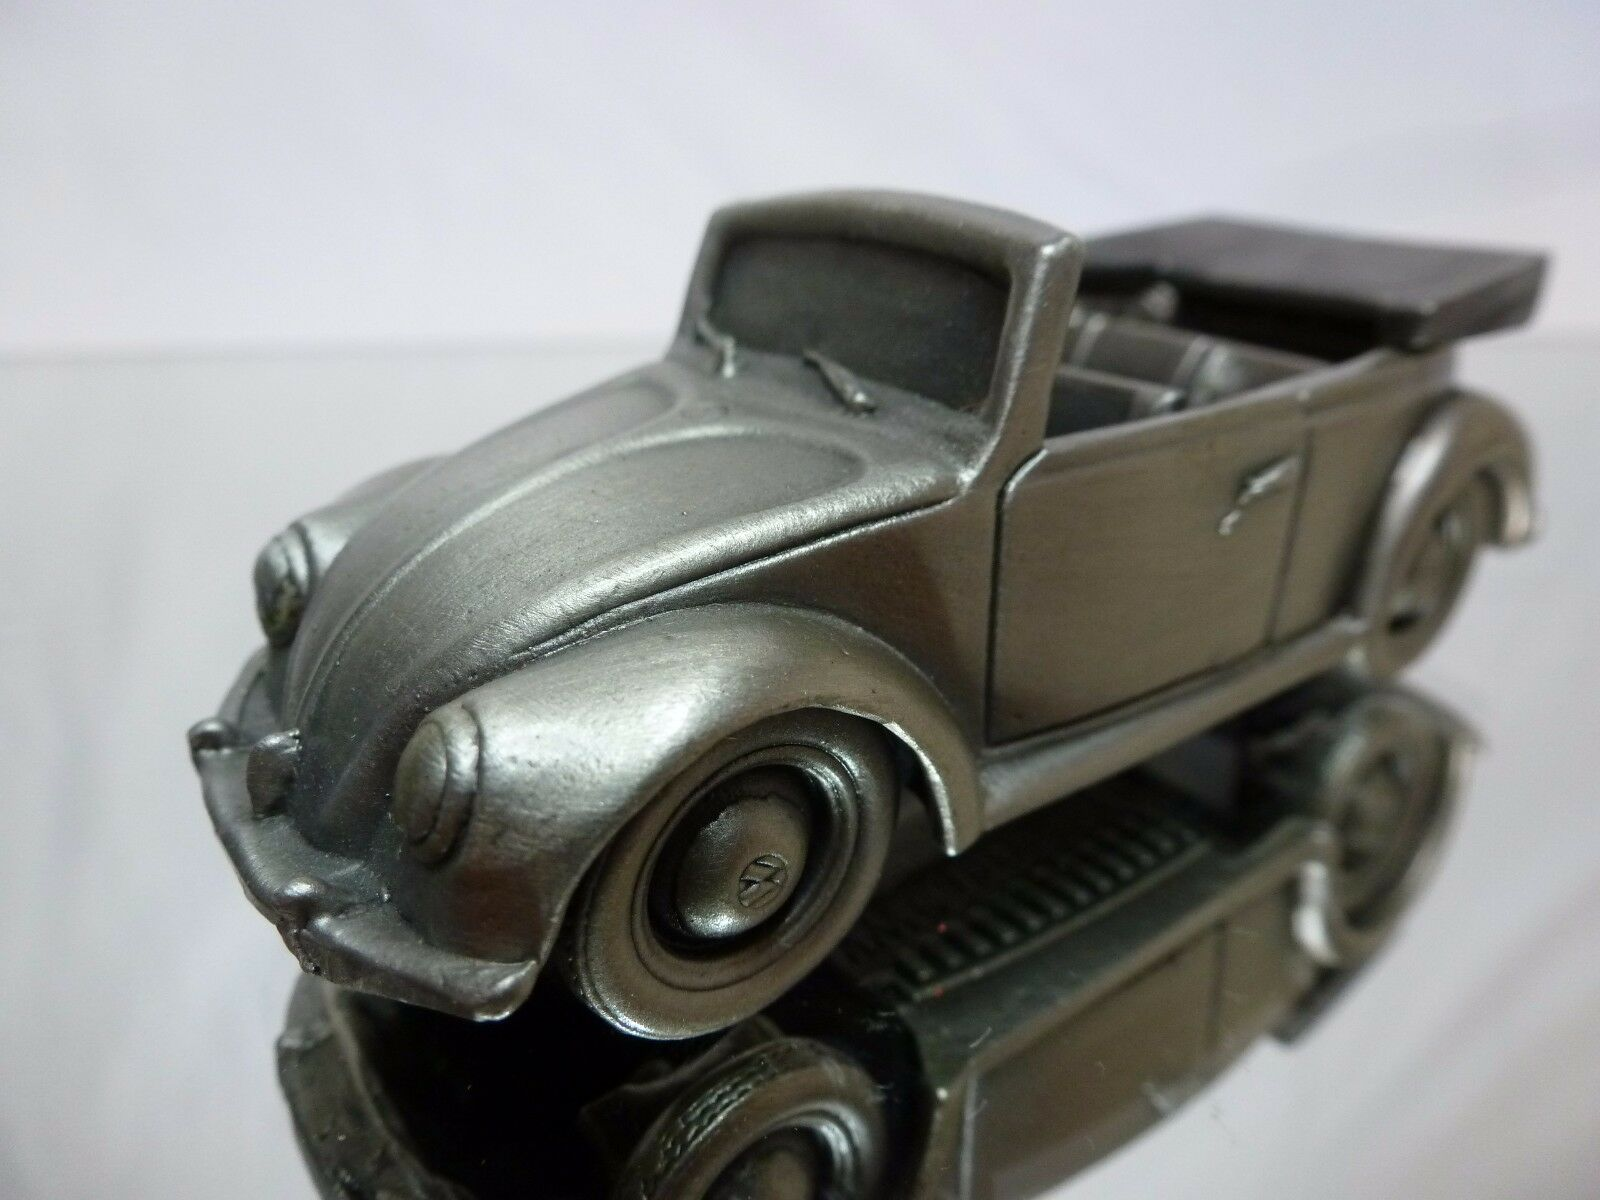 TIN METAL GERMANY VW VOLKSWAGEN BEETLE CABRIOLET 1949 - 1 43 - GOOD CONDITION